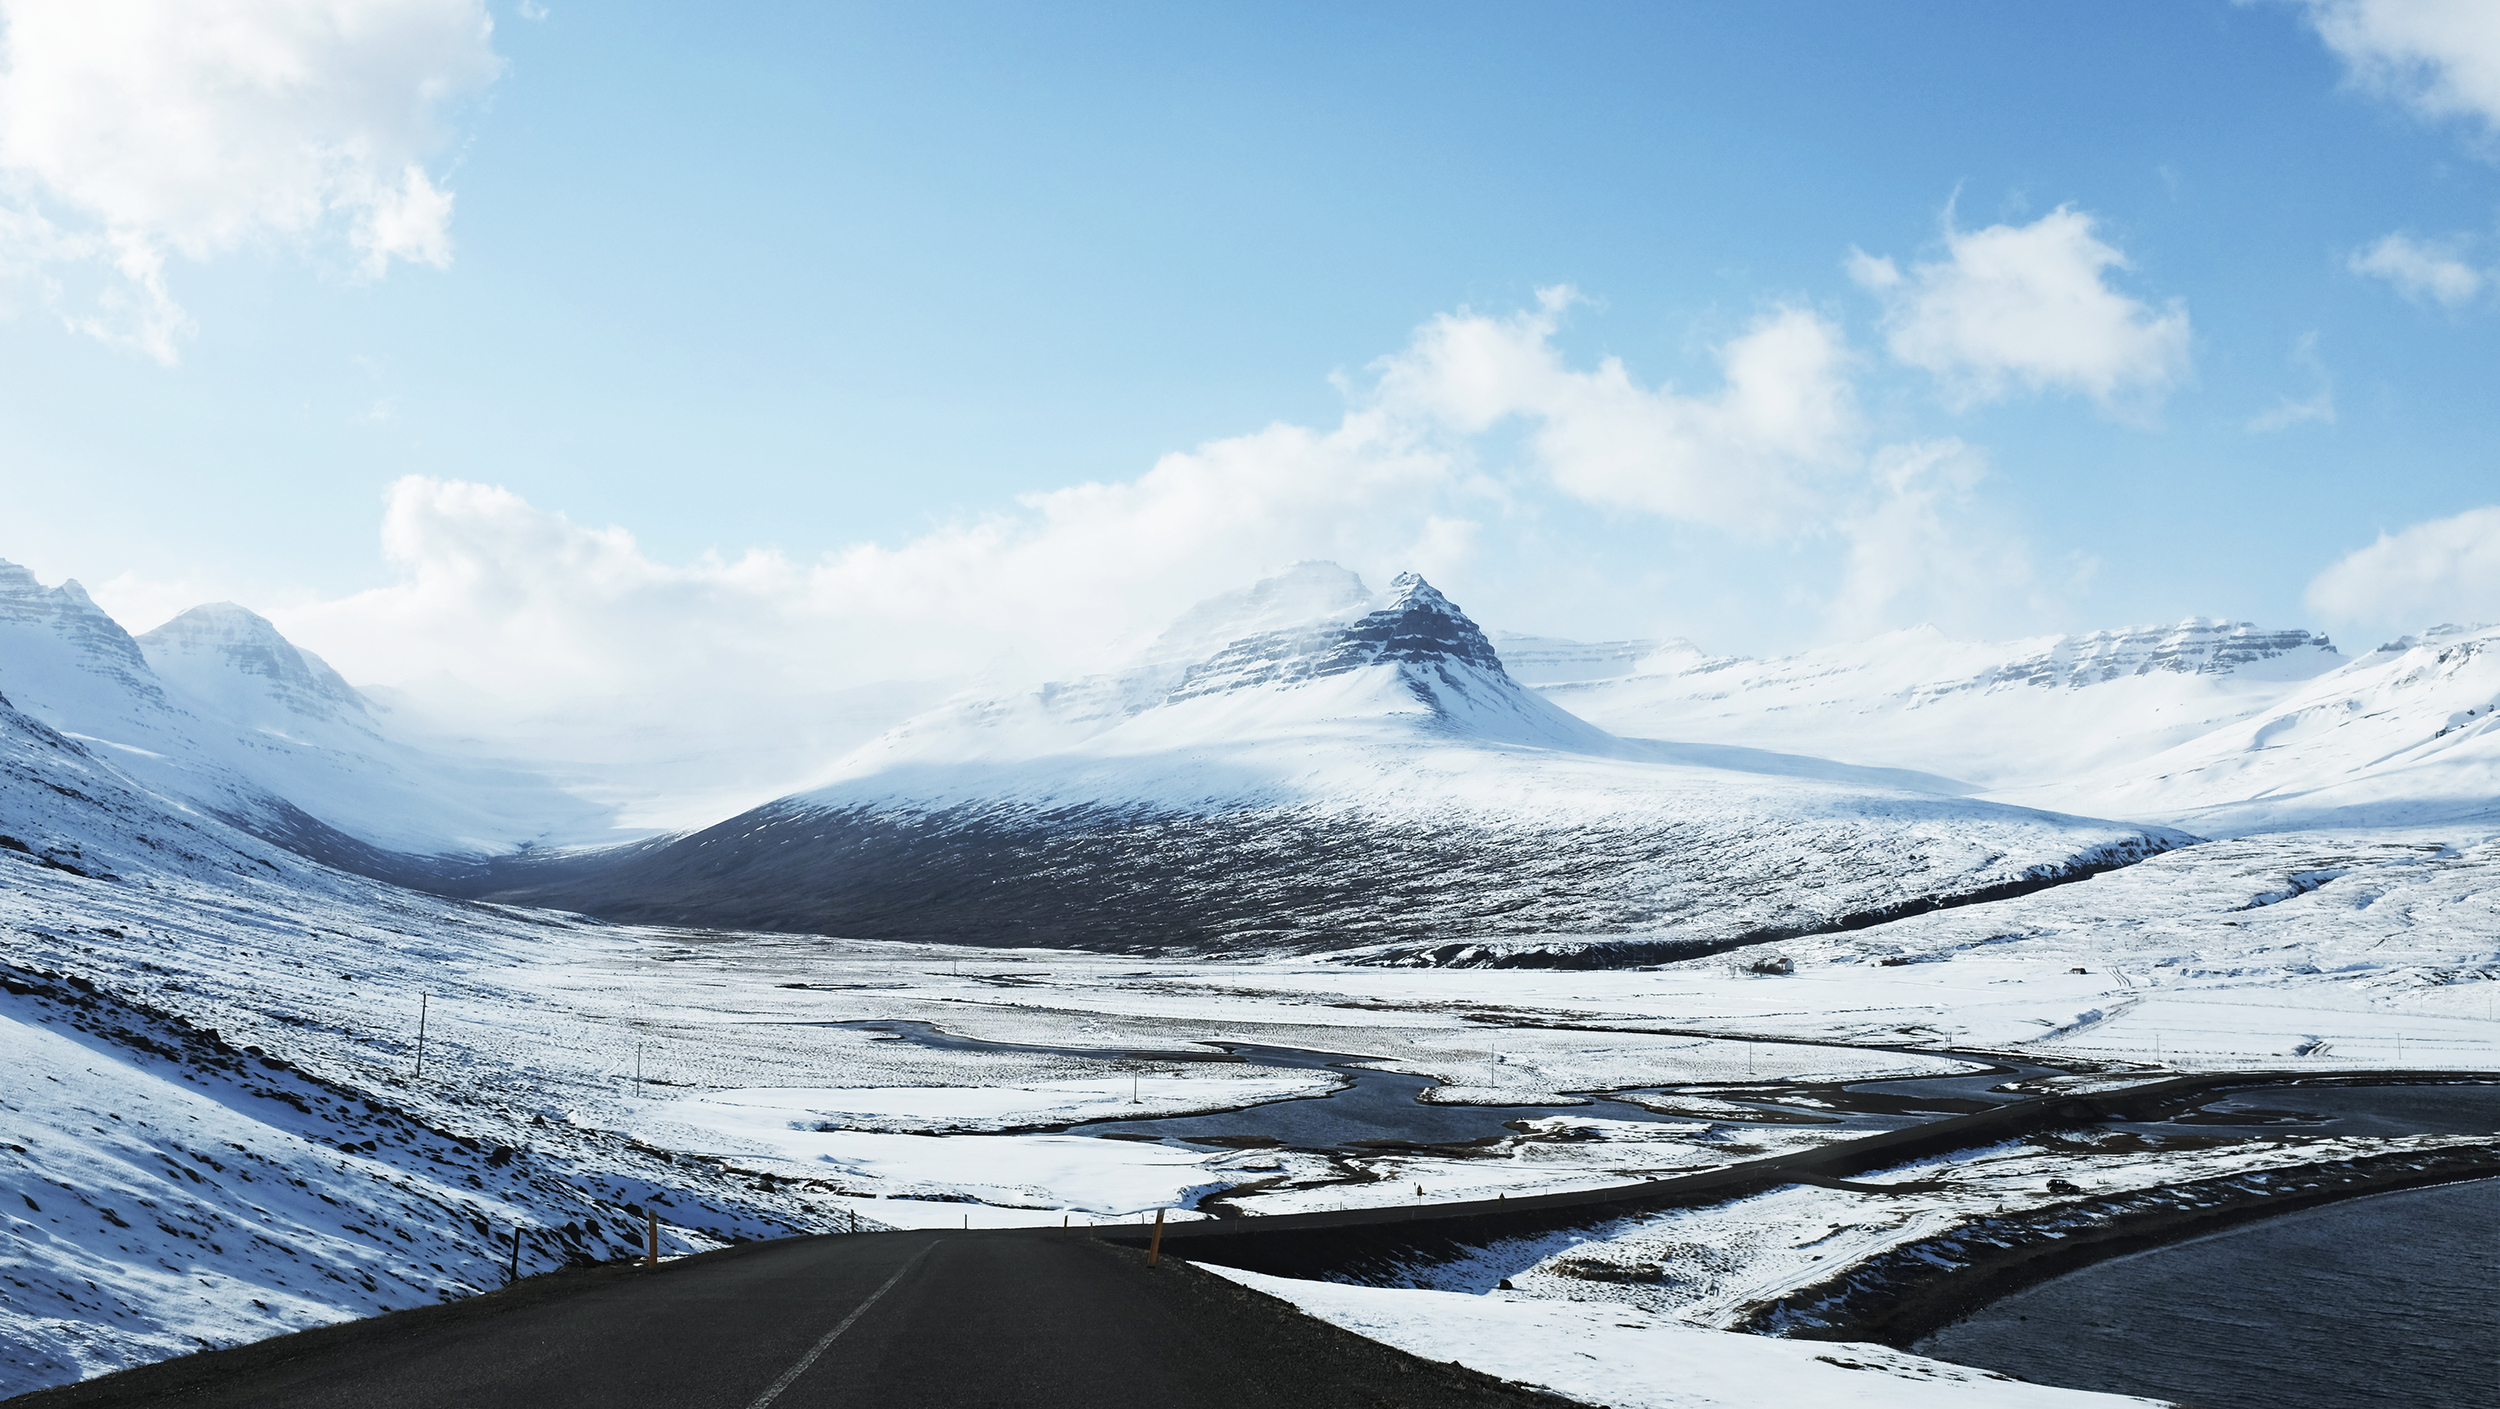 15_05_06_Iceland_East0395F.jpg